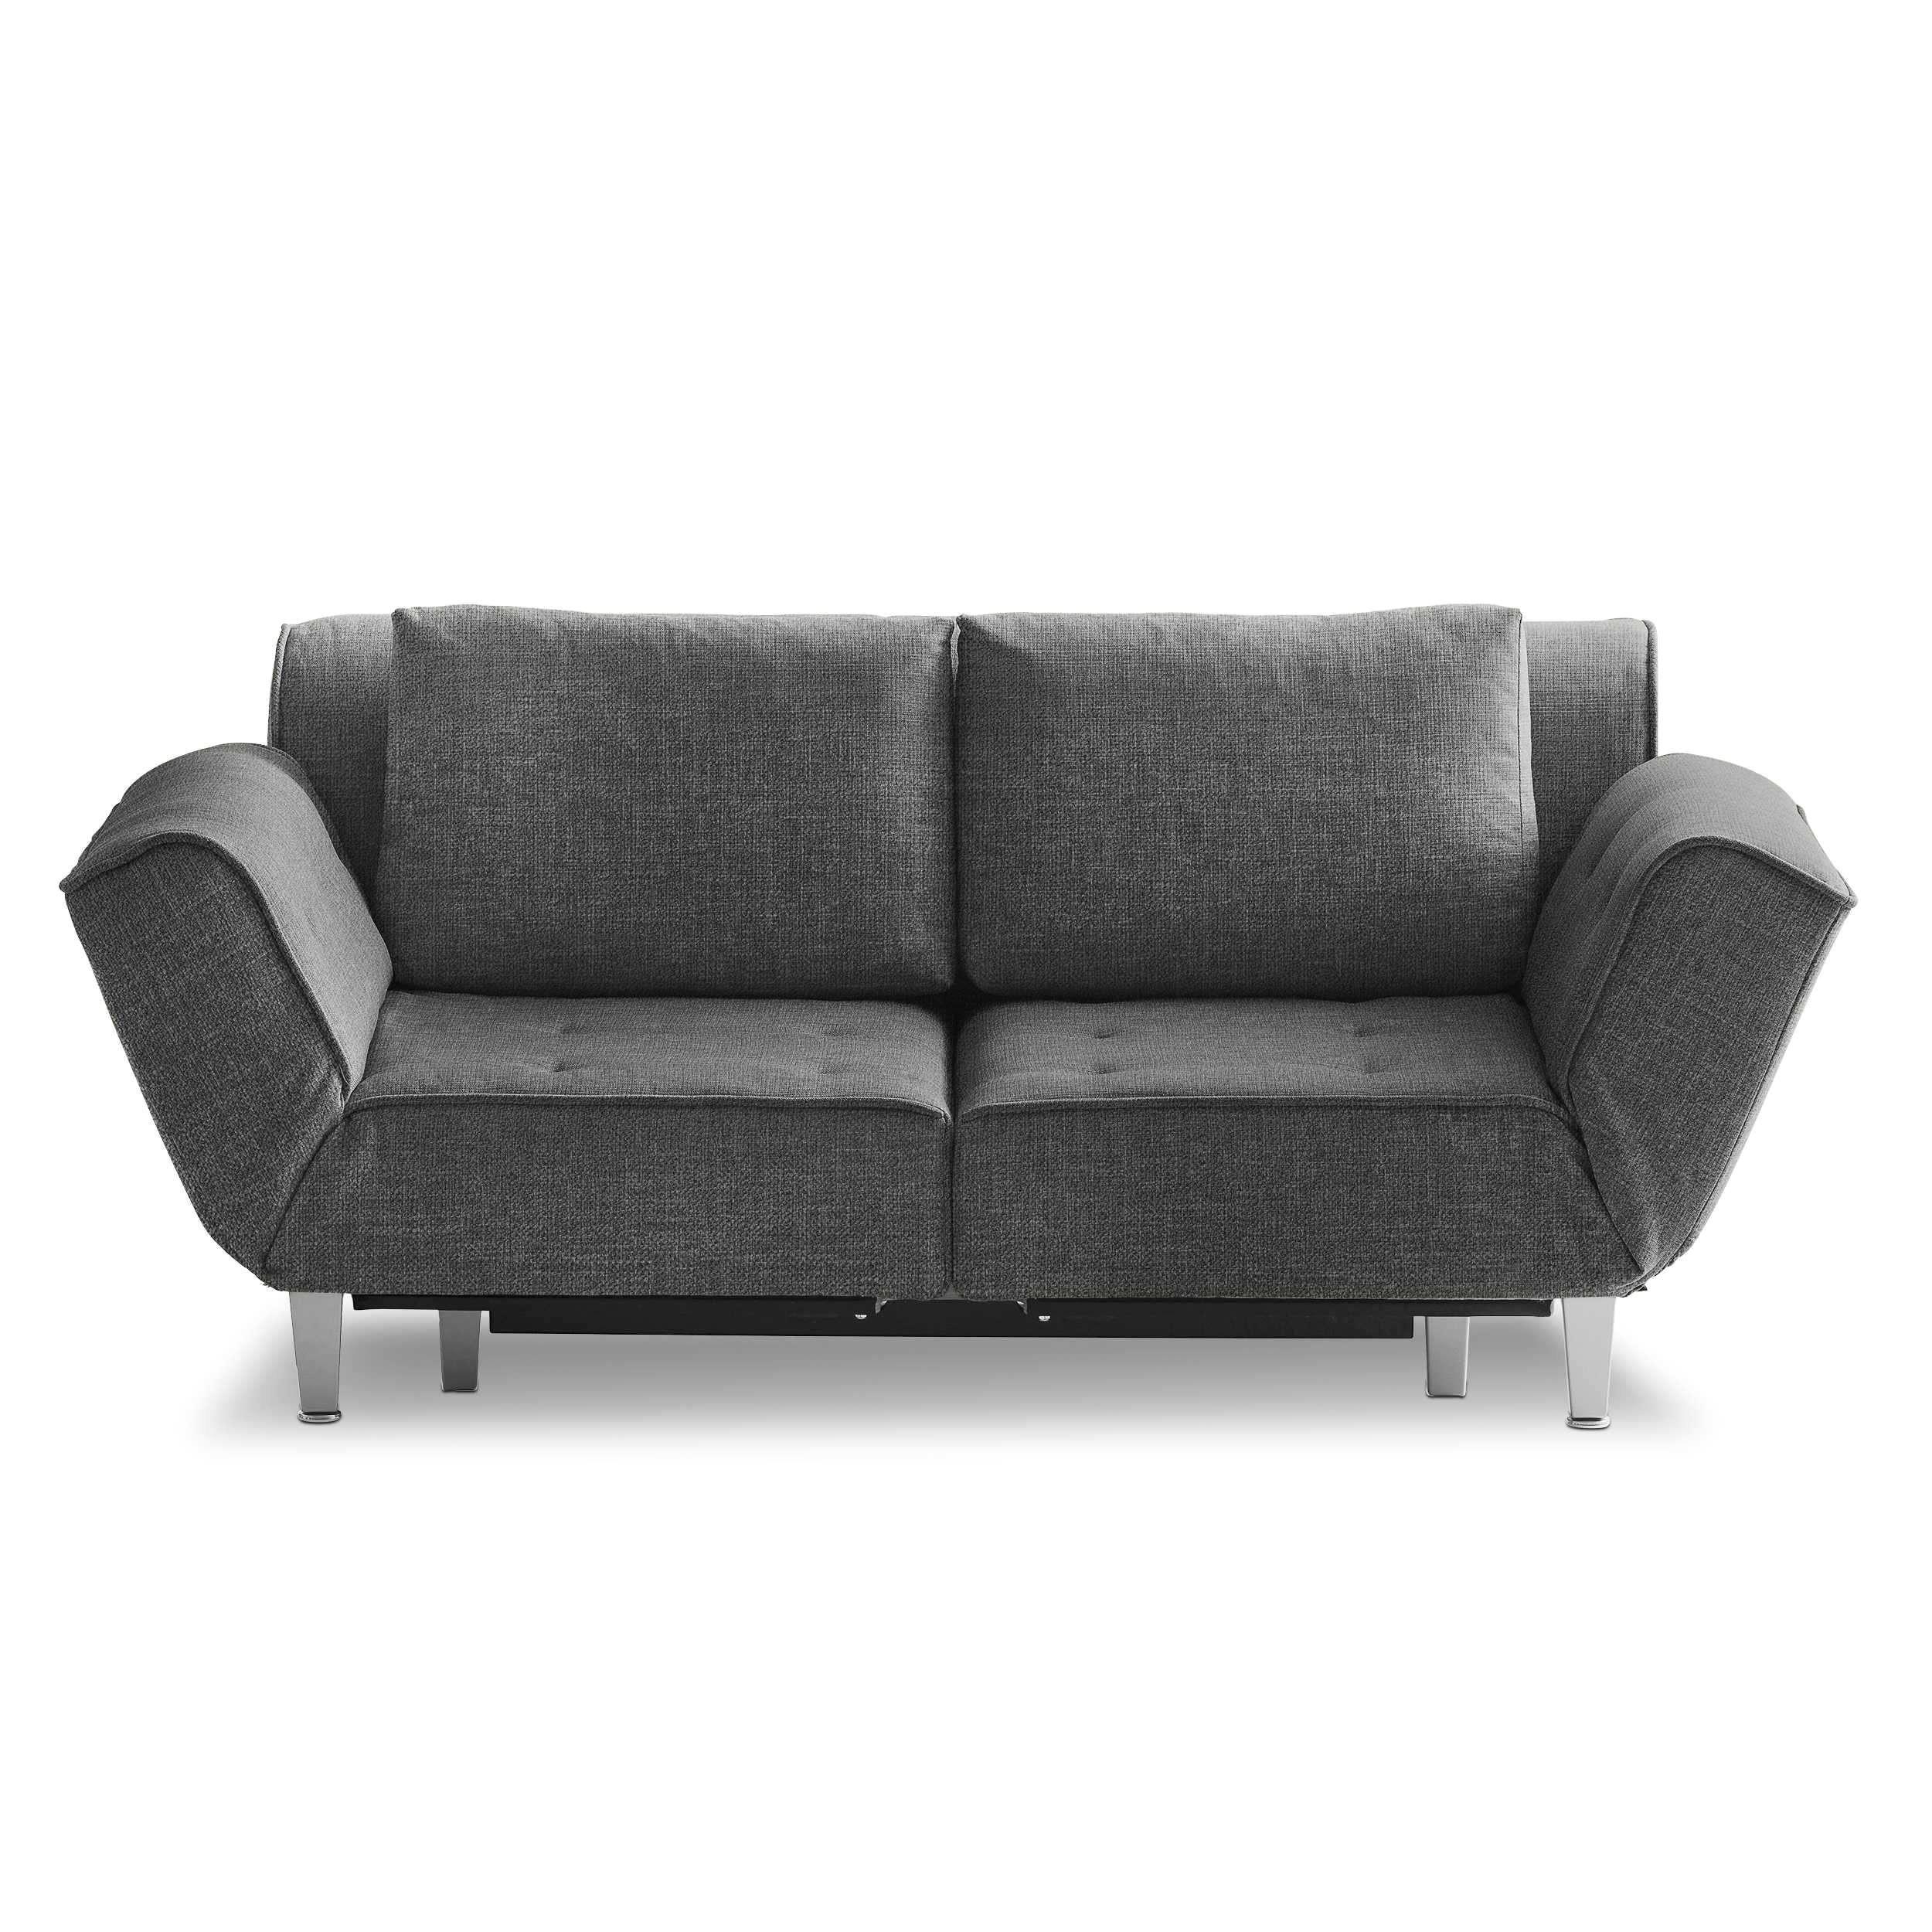 Fold Out Sleeper Chair Ikea Ikea Kautsch Inspirierend sofa Grau Stoff Graue Couch 0d Archives